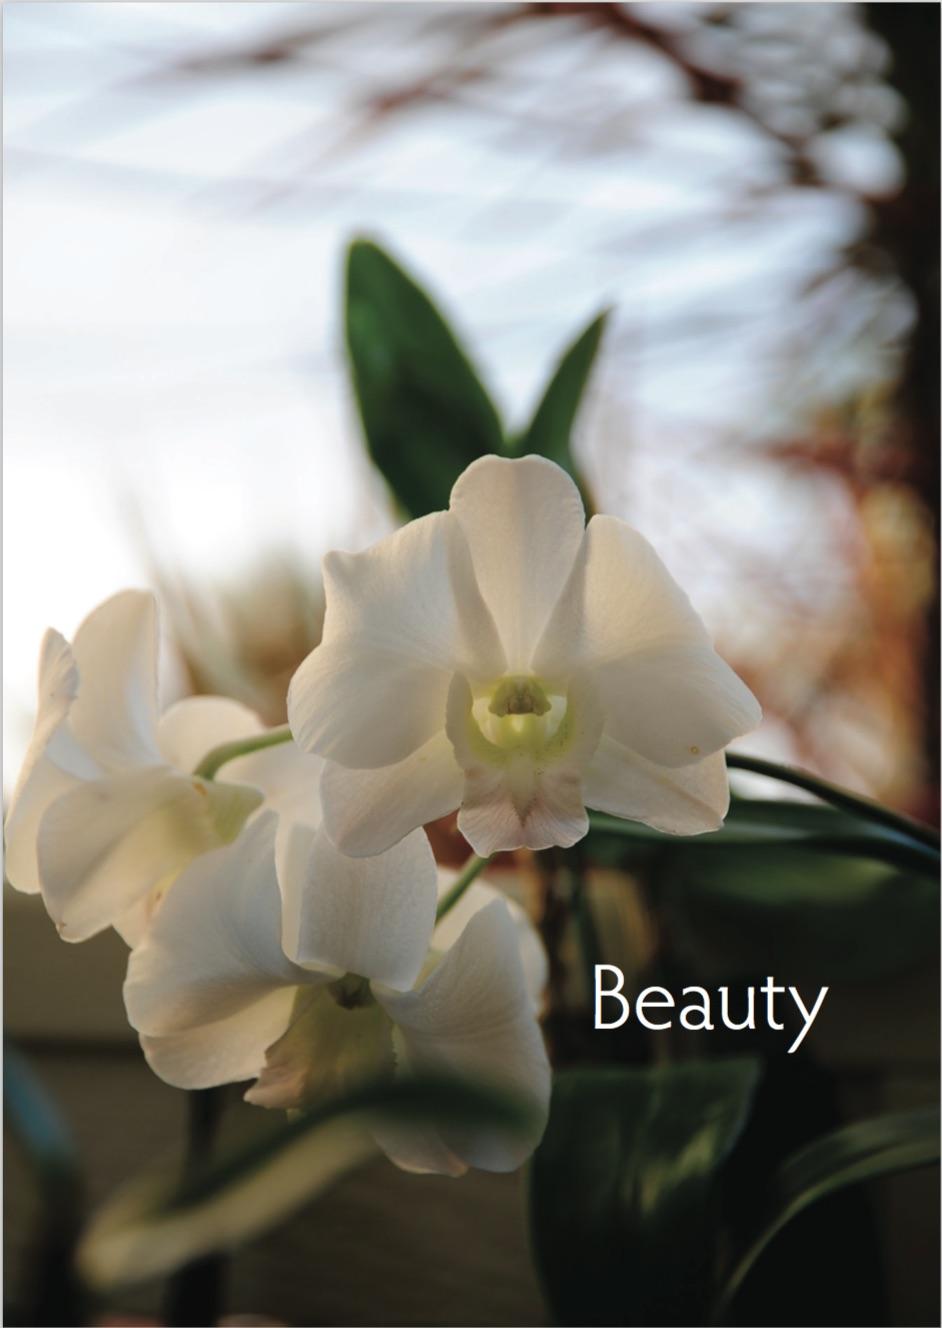 Beauty Cover JPEG.jpg